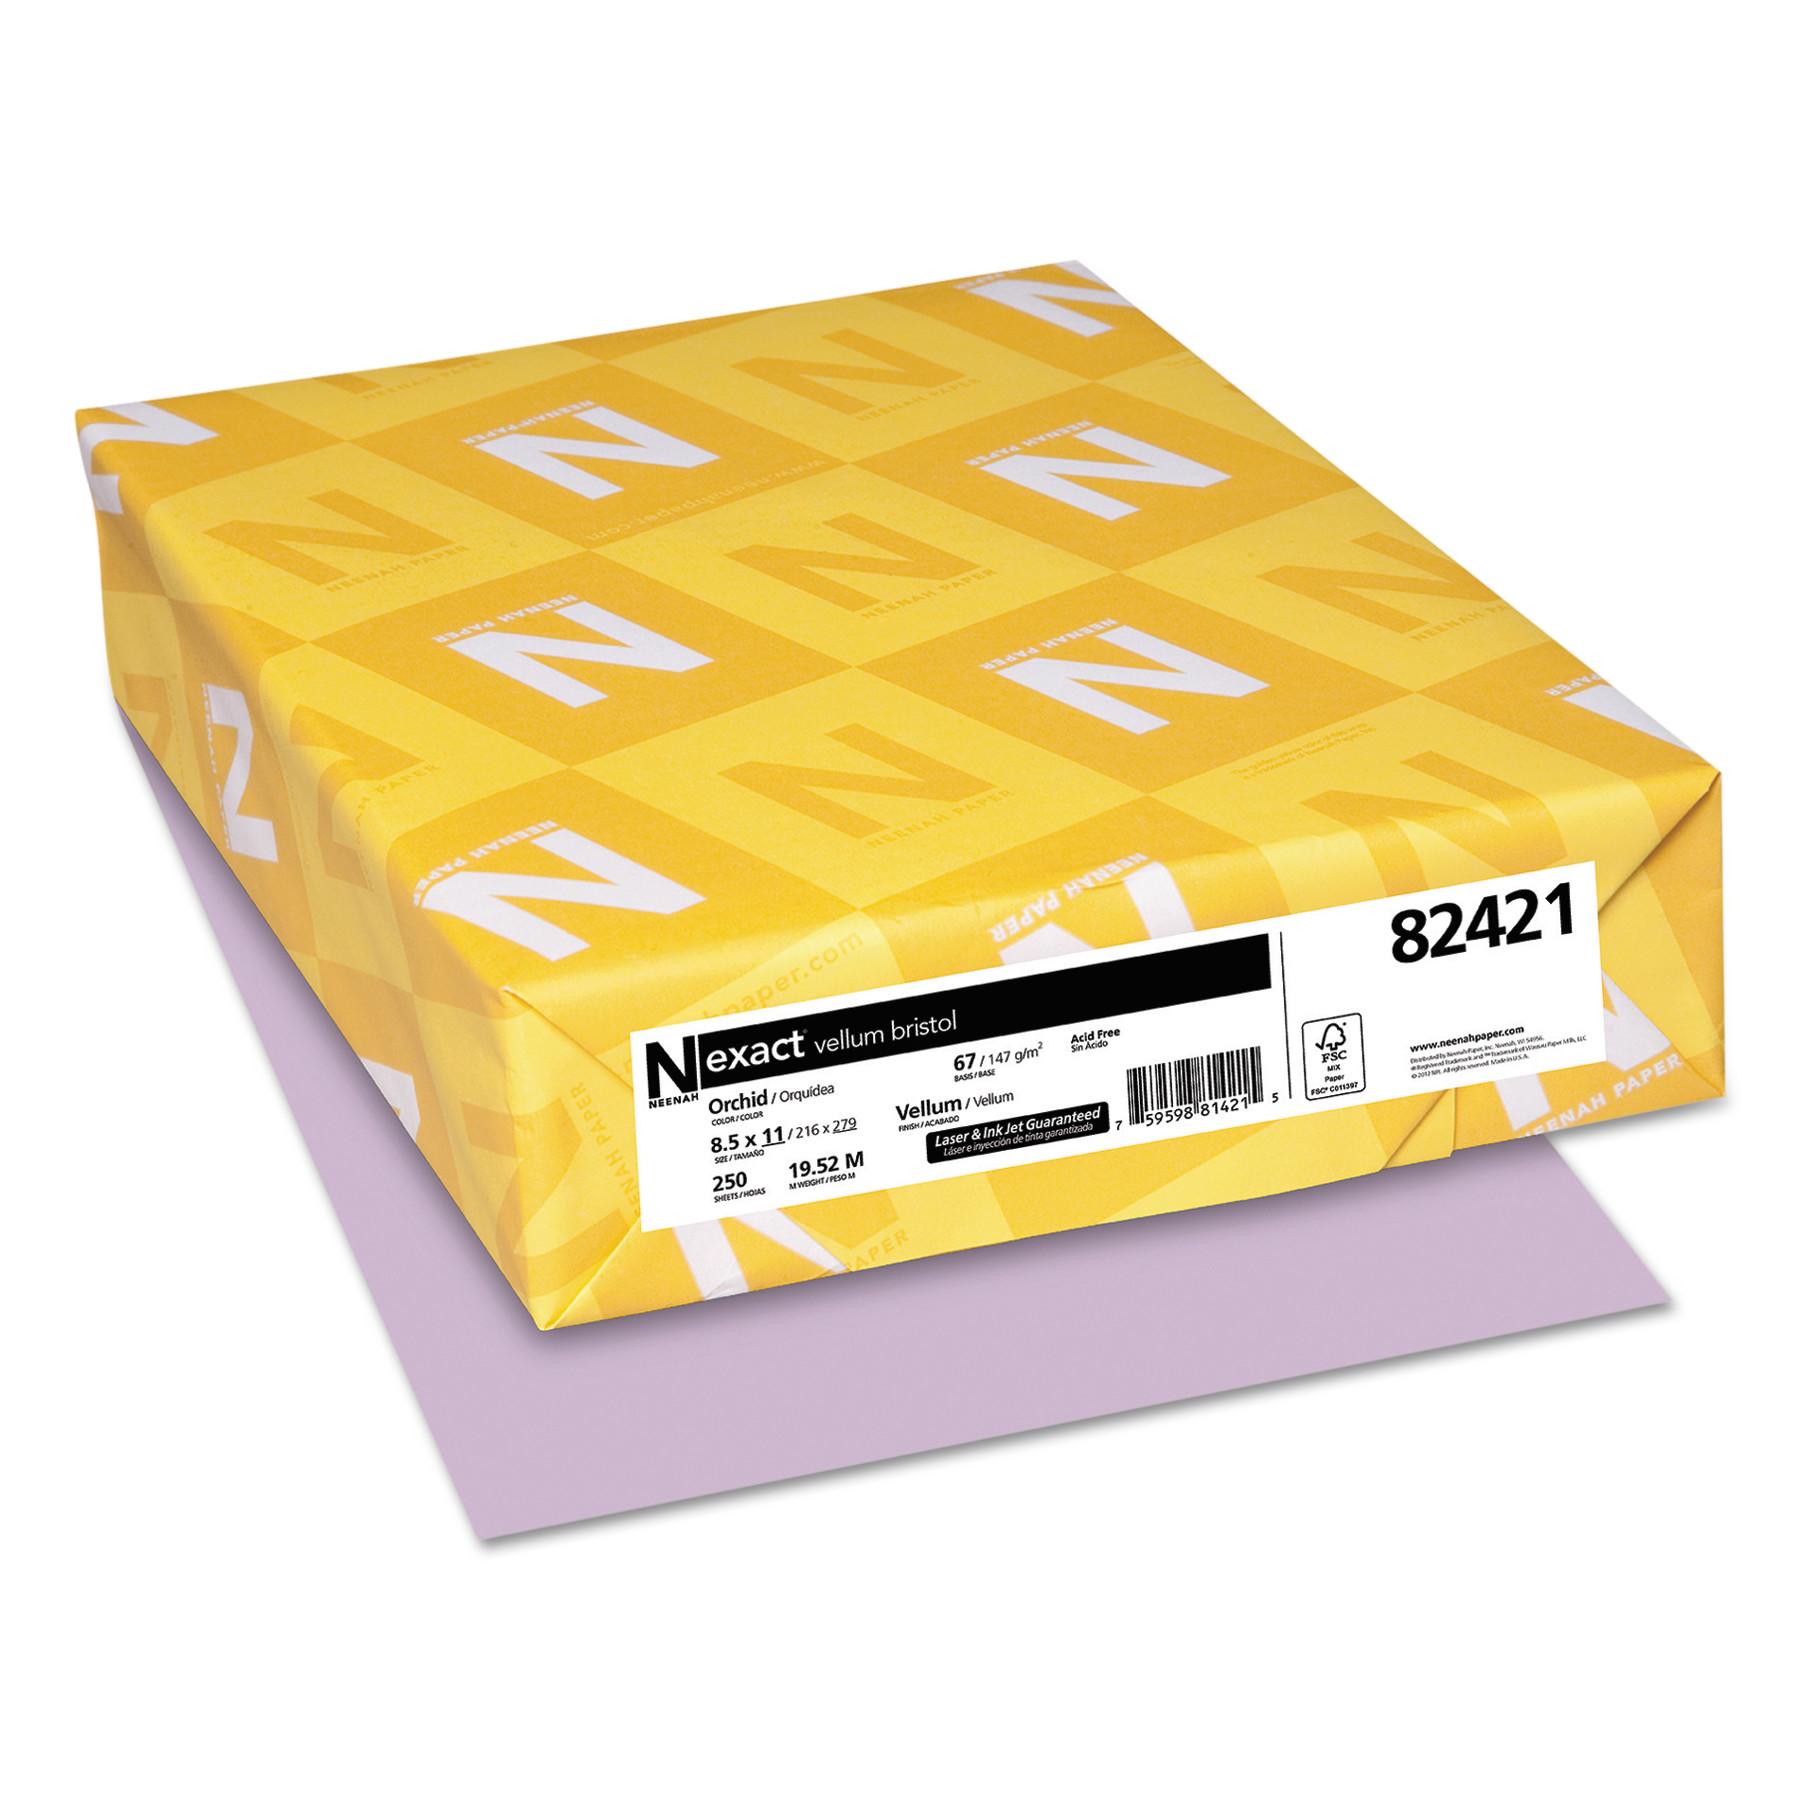 Neenah Paper Exact Vellum Bristol Cover Stock, 67lb, 8 1/2 x 11, Orchid, 250 Sheets -WAU82421